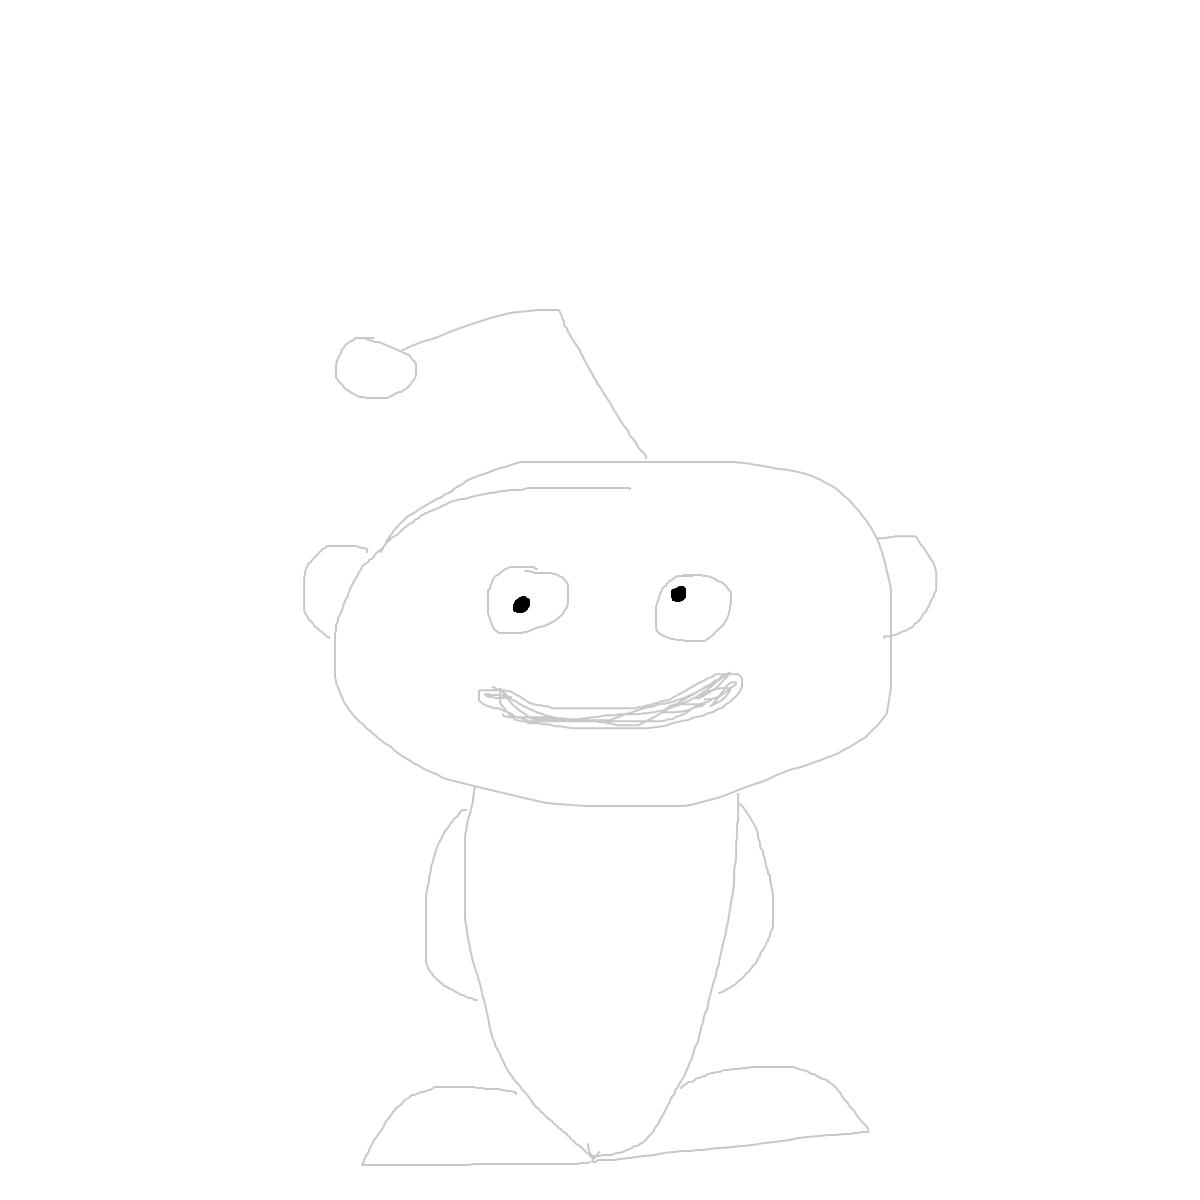 BAAAM drawing#9909 lat:52.4752120971679700lng: 13.4075355529785160